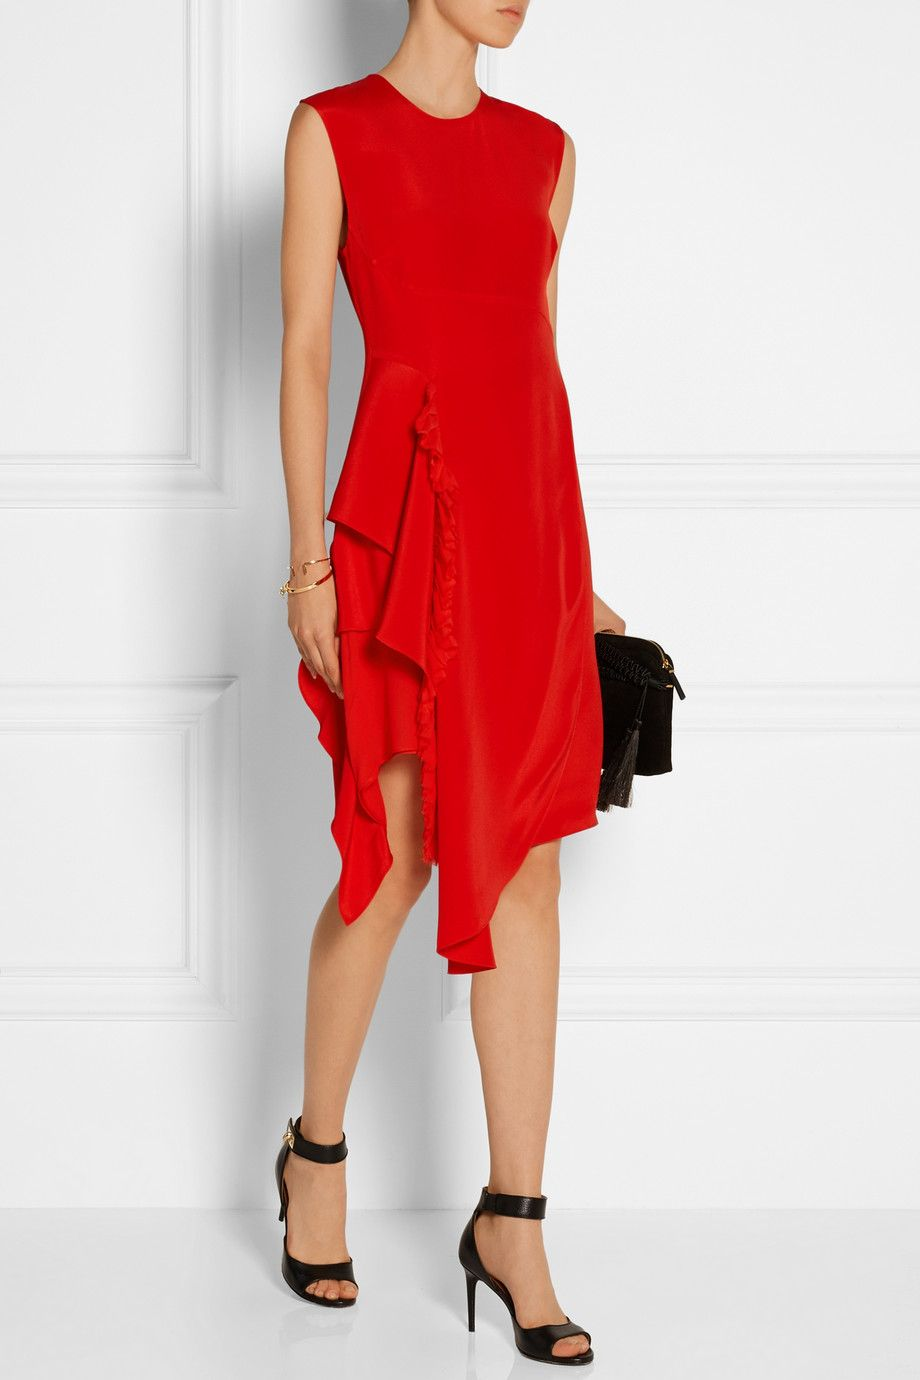 8860a5864b0 3.1 Phillip Lim - Ruffled silk-crepe dress